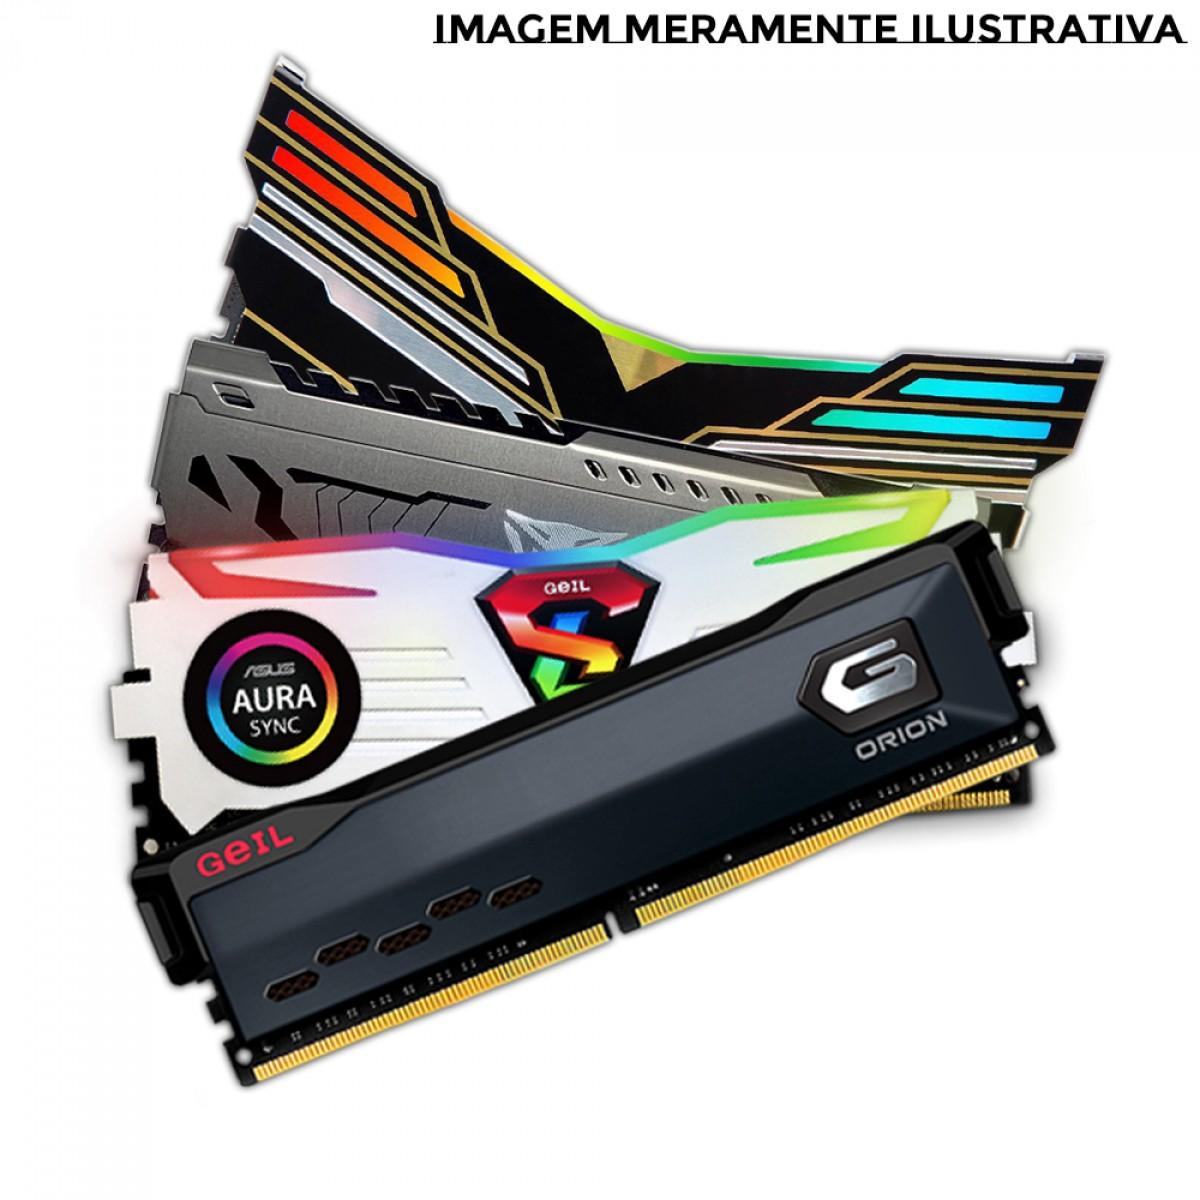 Kit Upgrade, AMD Ryzen 3 PRO 4350G + GIGABYTE B450M GAMING  + Memória DDR4 8GB 3000MHz